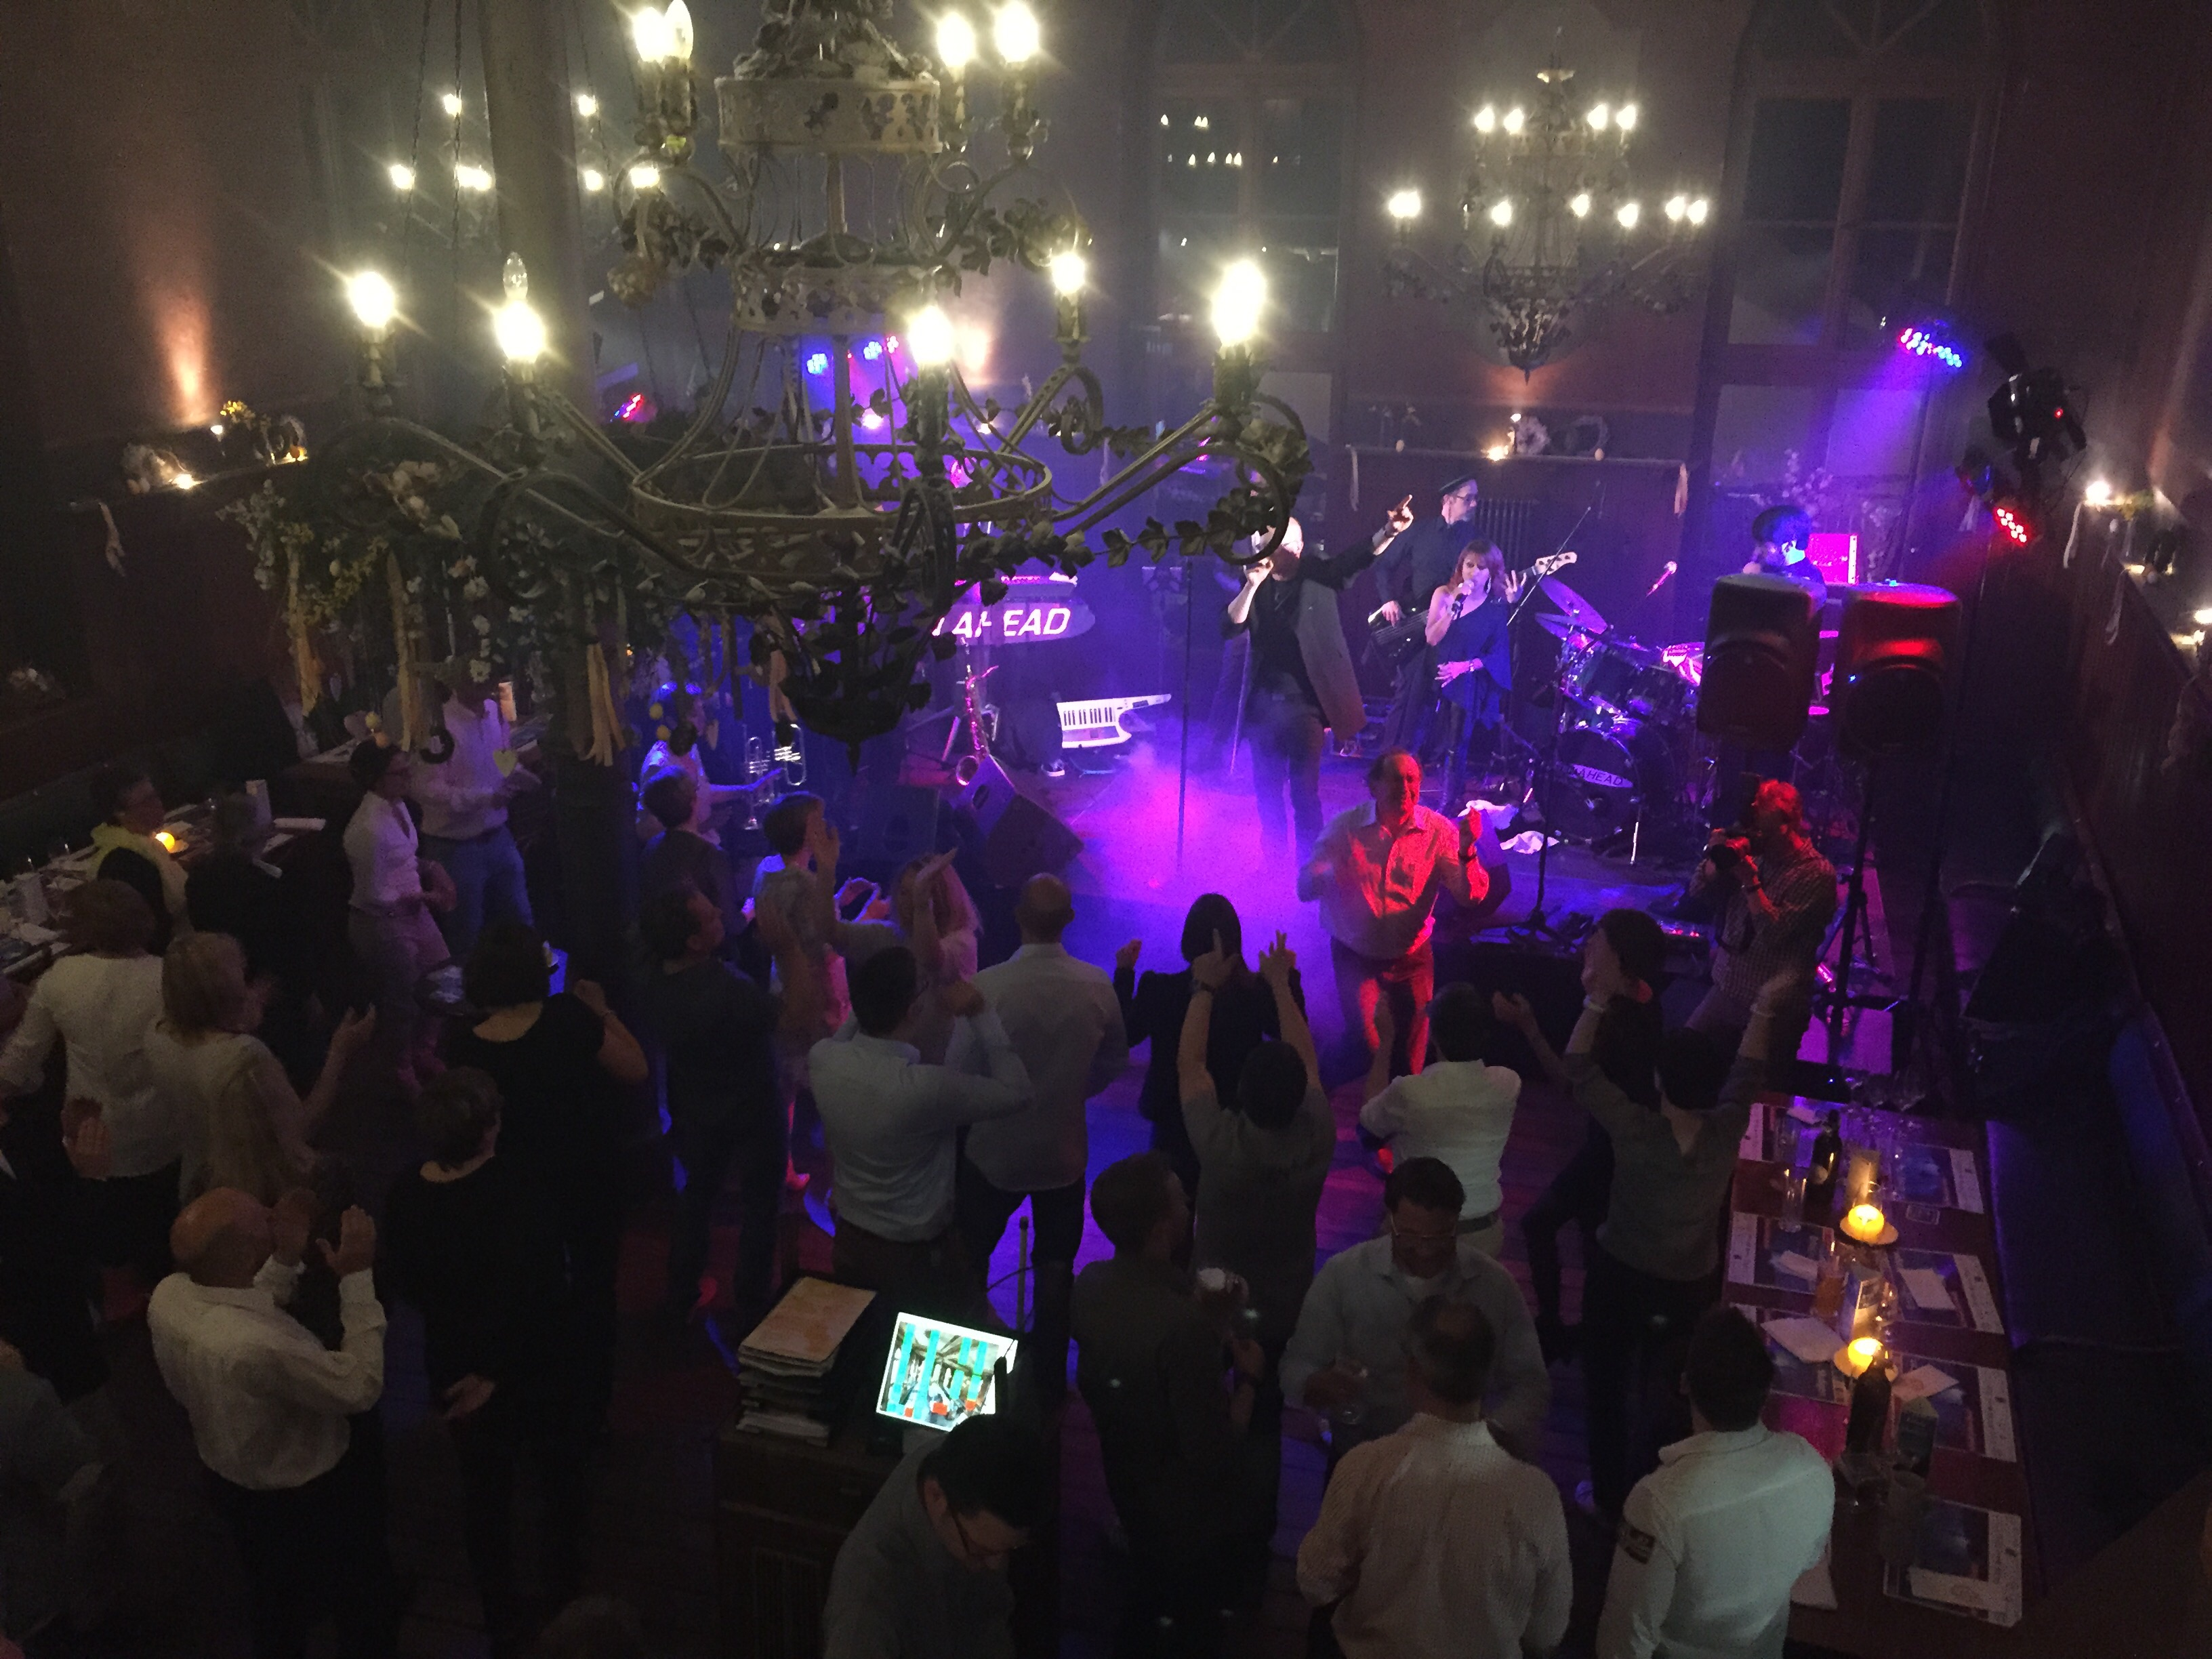 Liveband, Coverband,  Partyband, ten ahead, tenahead, heidelberg, Deutscher Apothekerverband, DAV